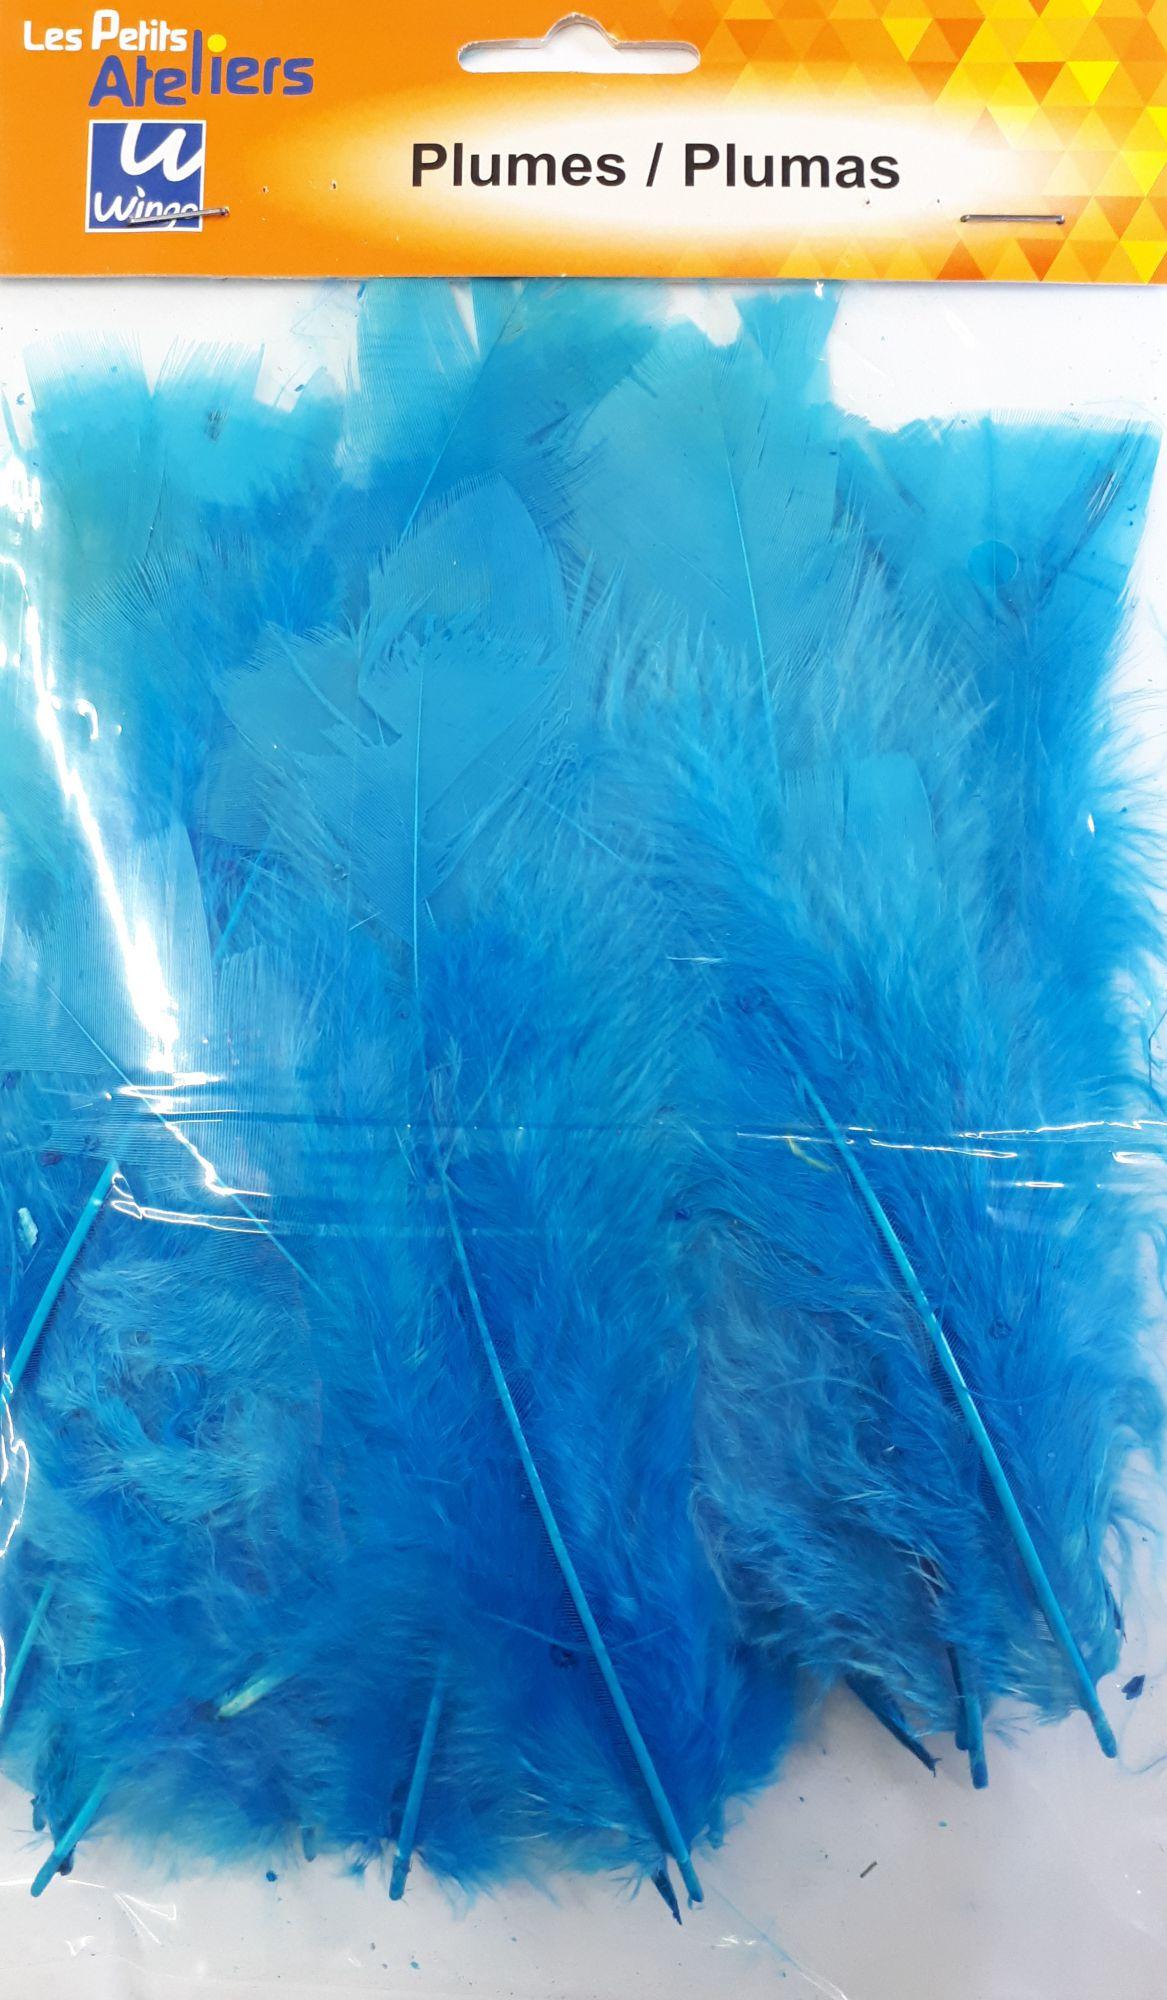 Plumes bleu x35 - les petits ateliers